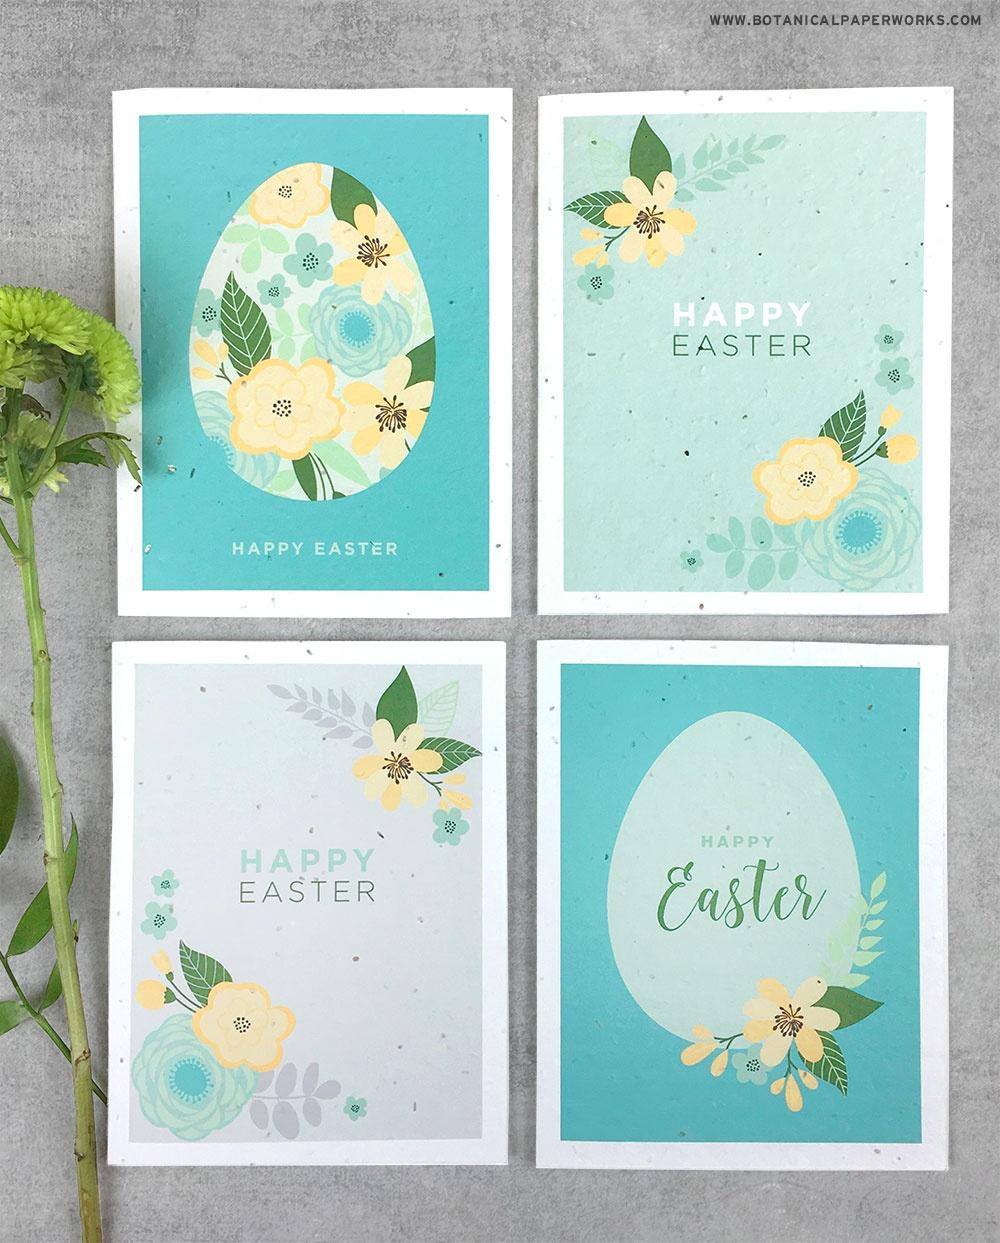 Free Printable} Easter Cards   Blog   Botanical Paperworks - Free Printable Easter Cards To Print